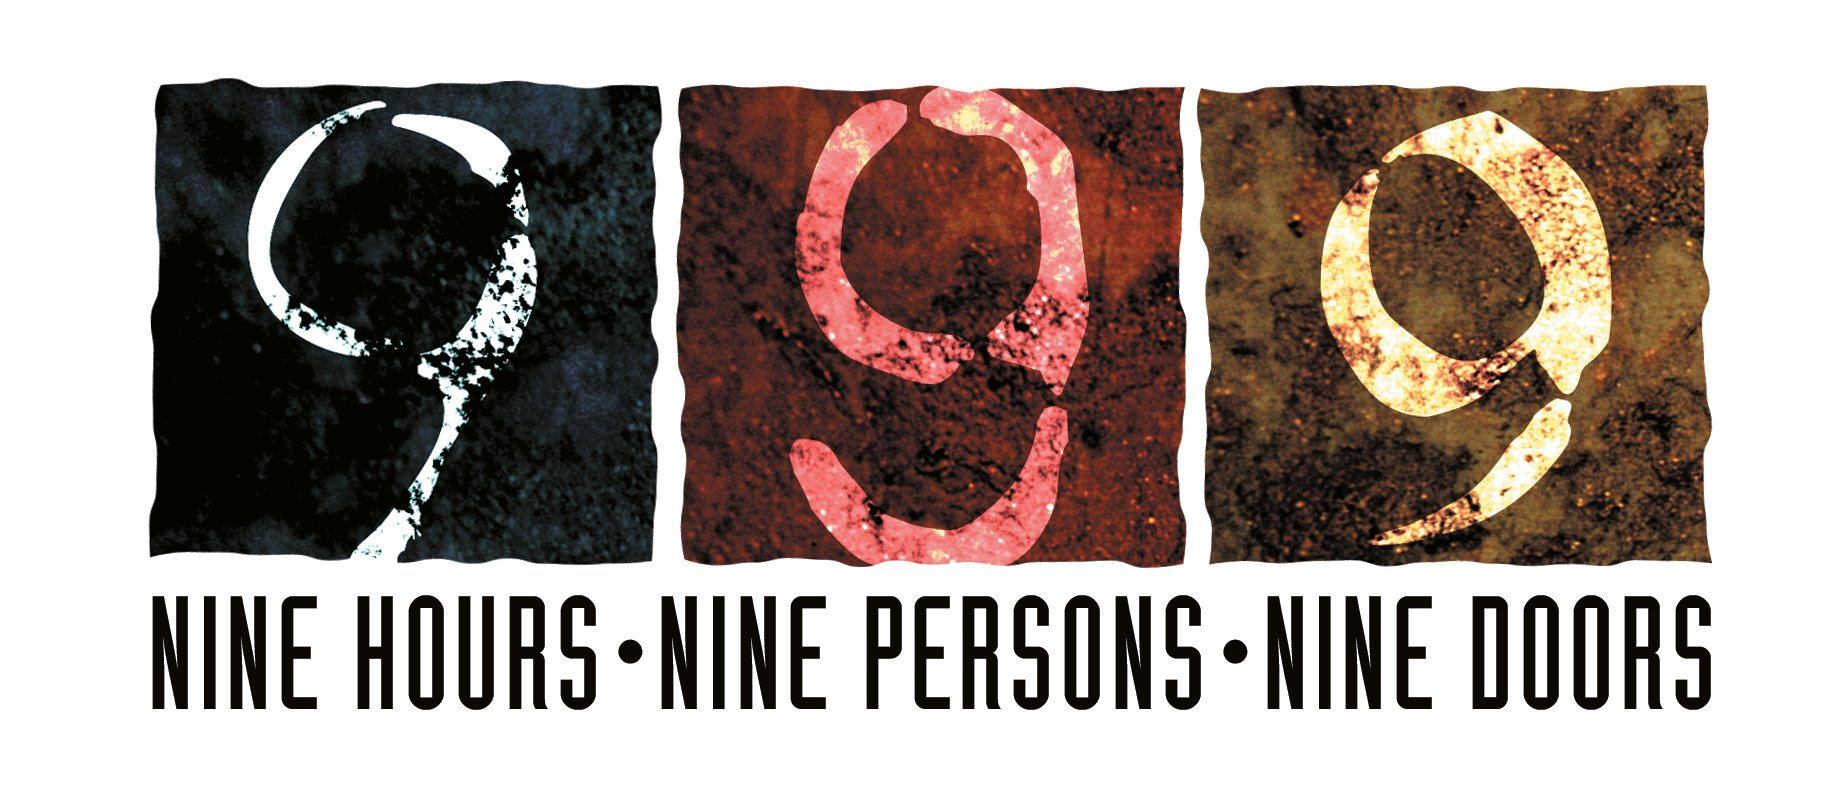 999: Nine Hours, Nine Persons, Nine Doors 2009